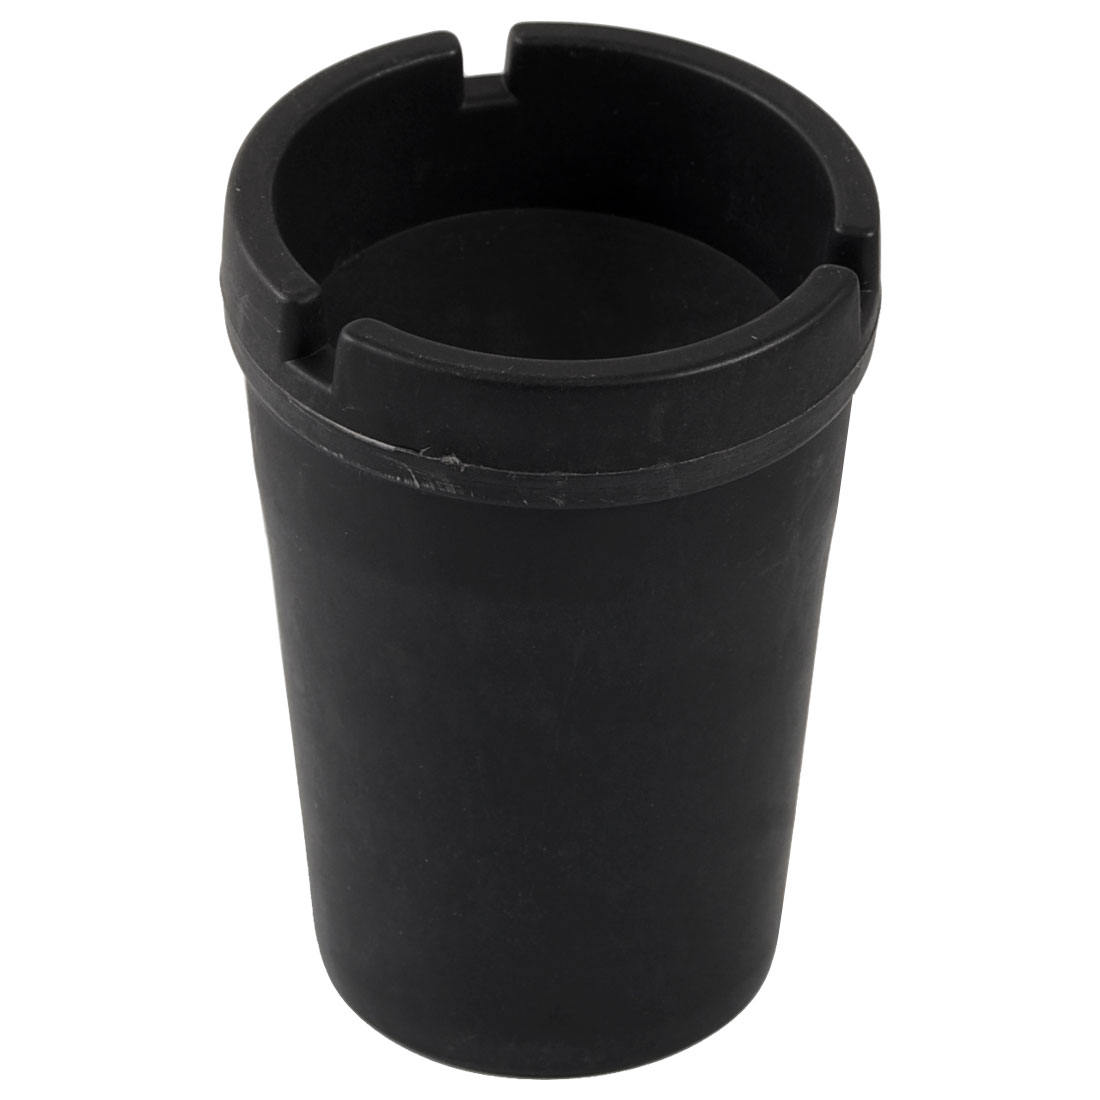 Car Extinguishing Bucket Black Ashtray Cigarette Bin Holder